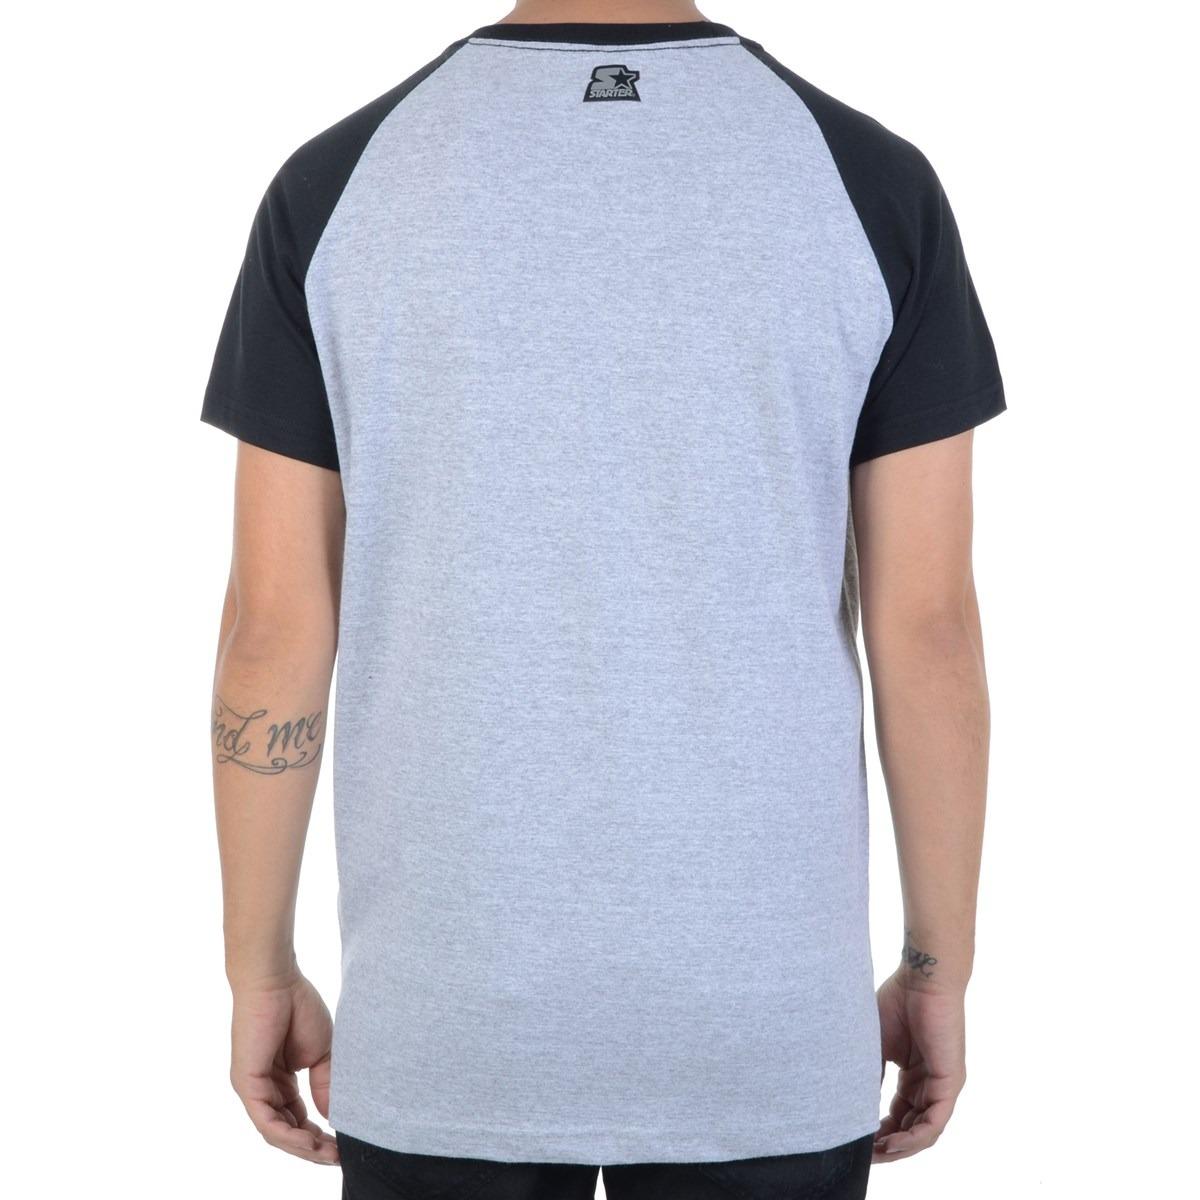 camiseta masculina starter especial recorte. Carregando zoom. 929c9e47a7f